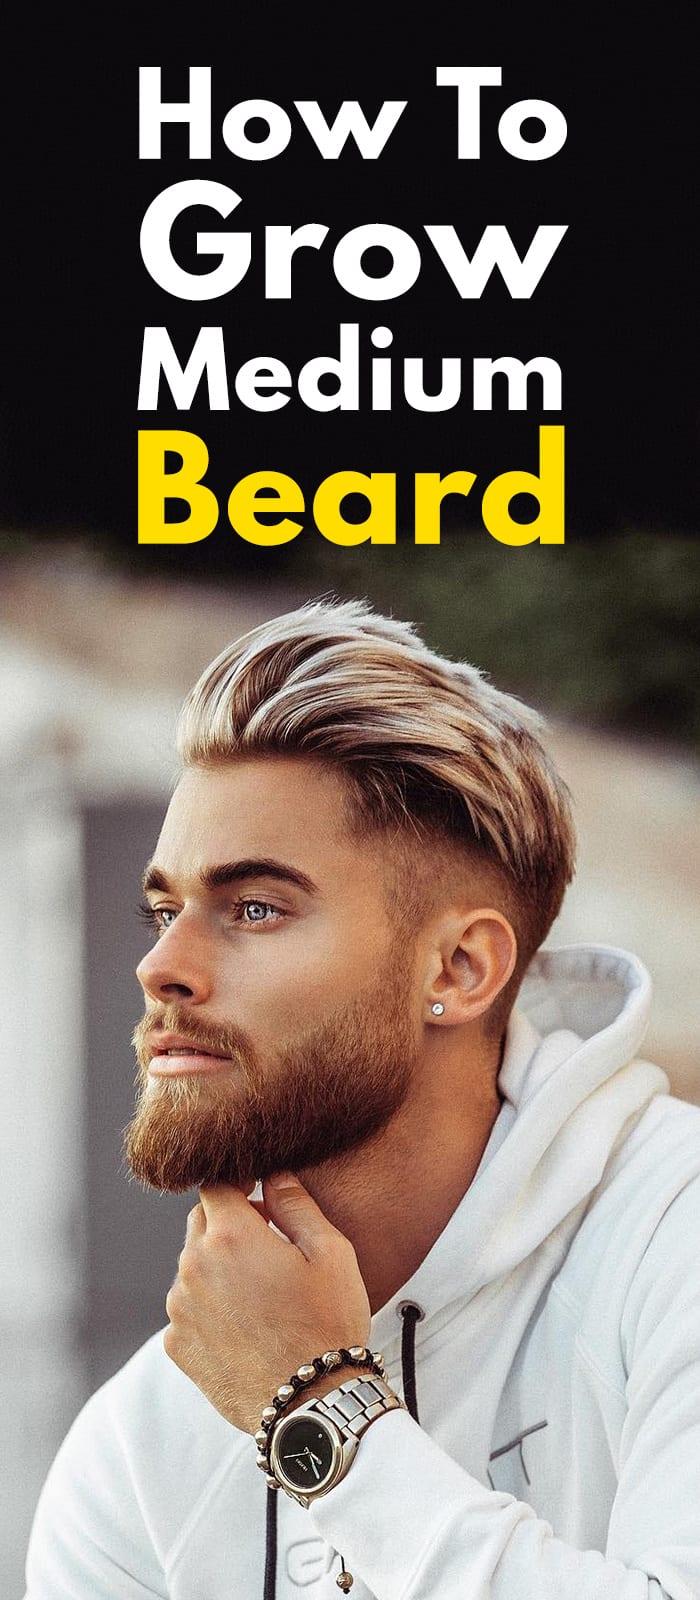 How To Grow Medium Beard.